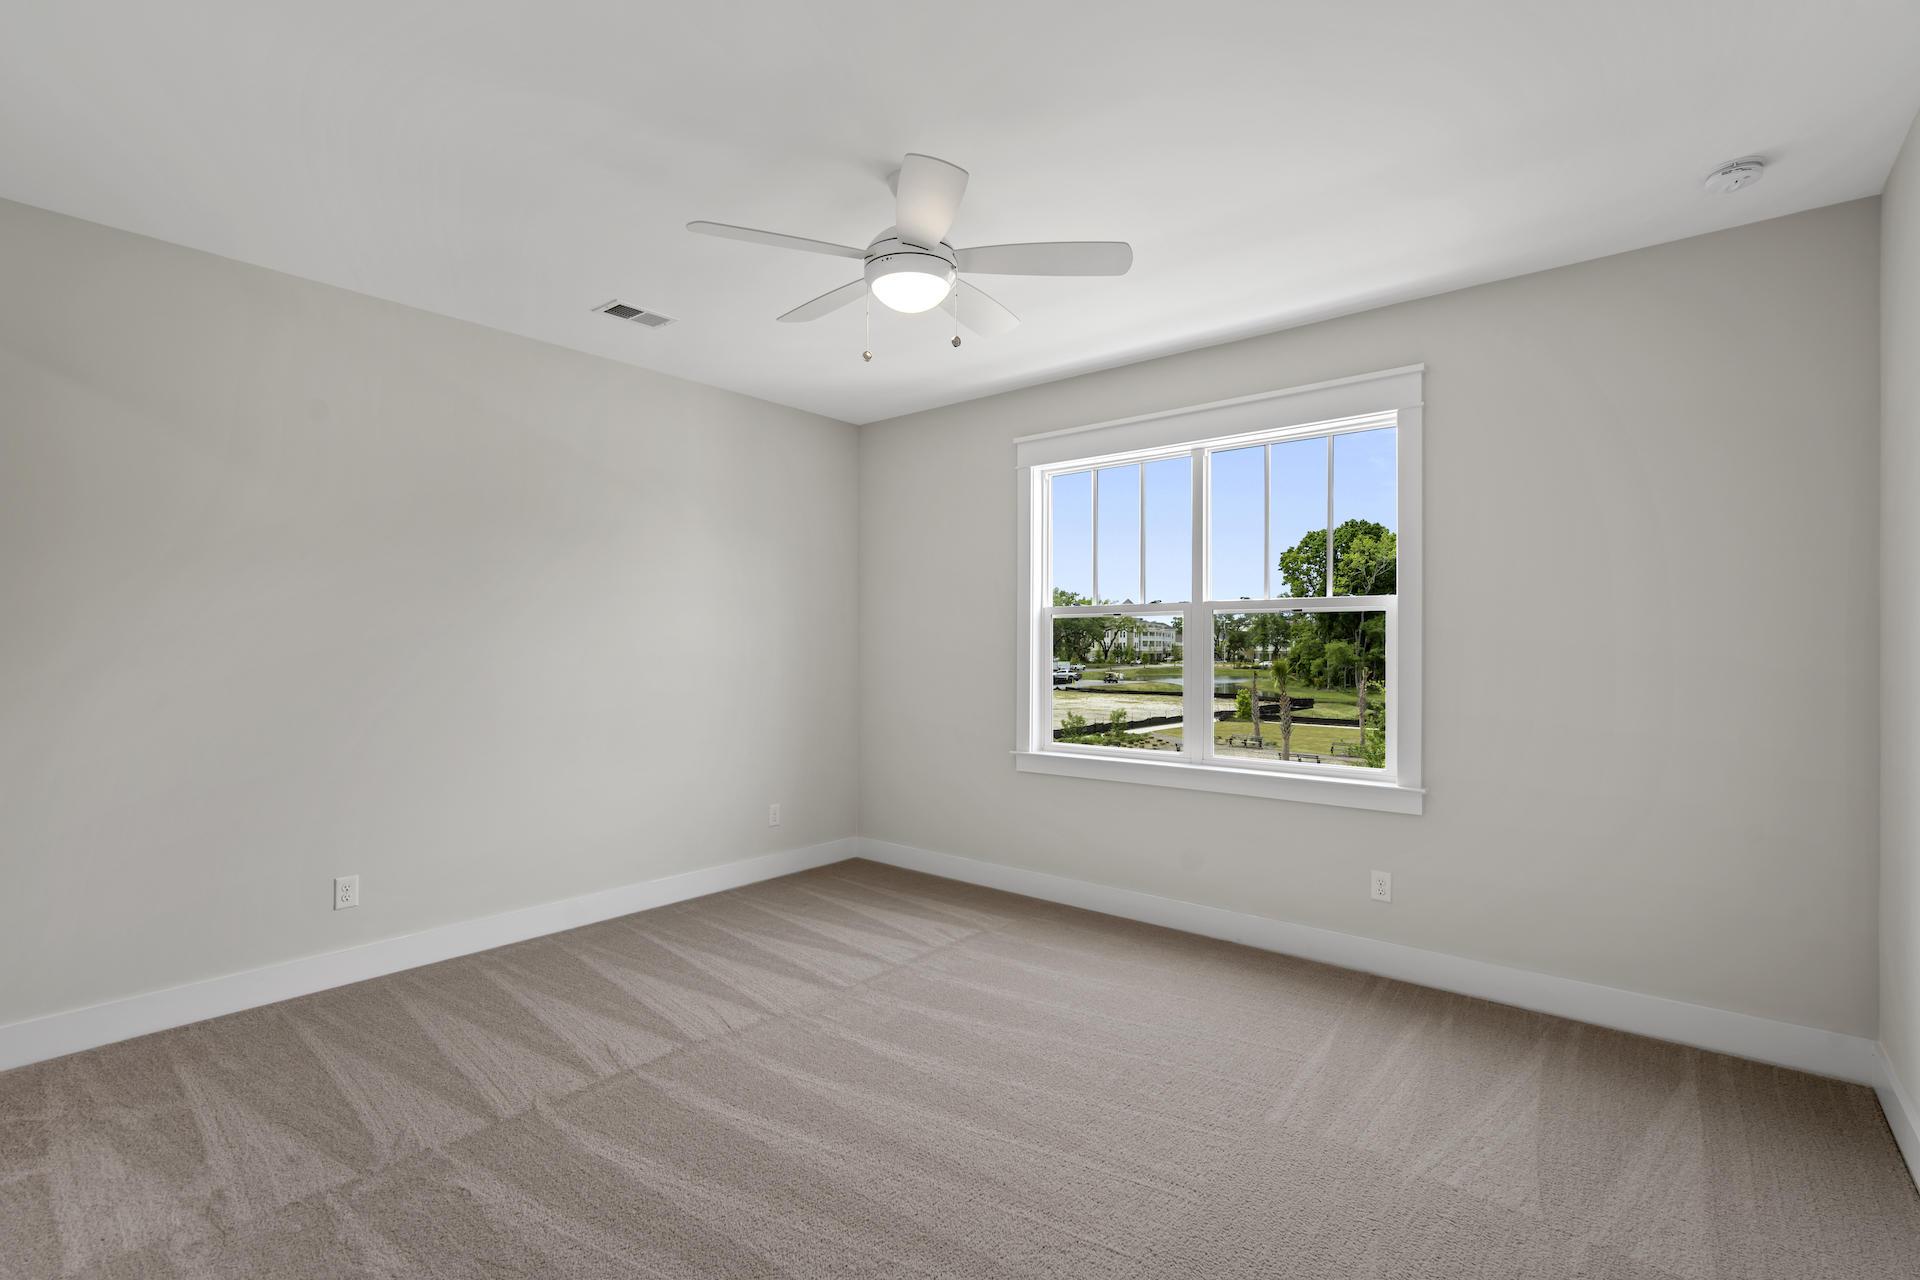 Midtown Homes For Sale - 1320 Upper Union, Mount Pleasant, SC - 18